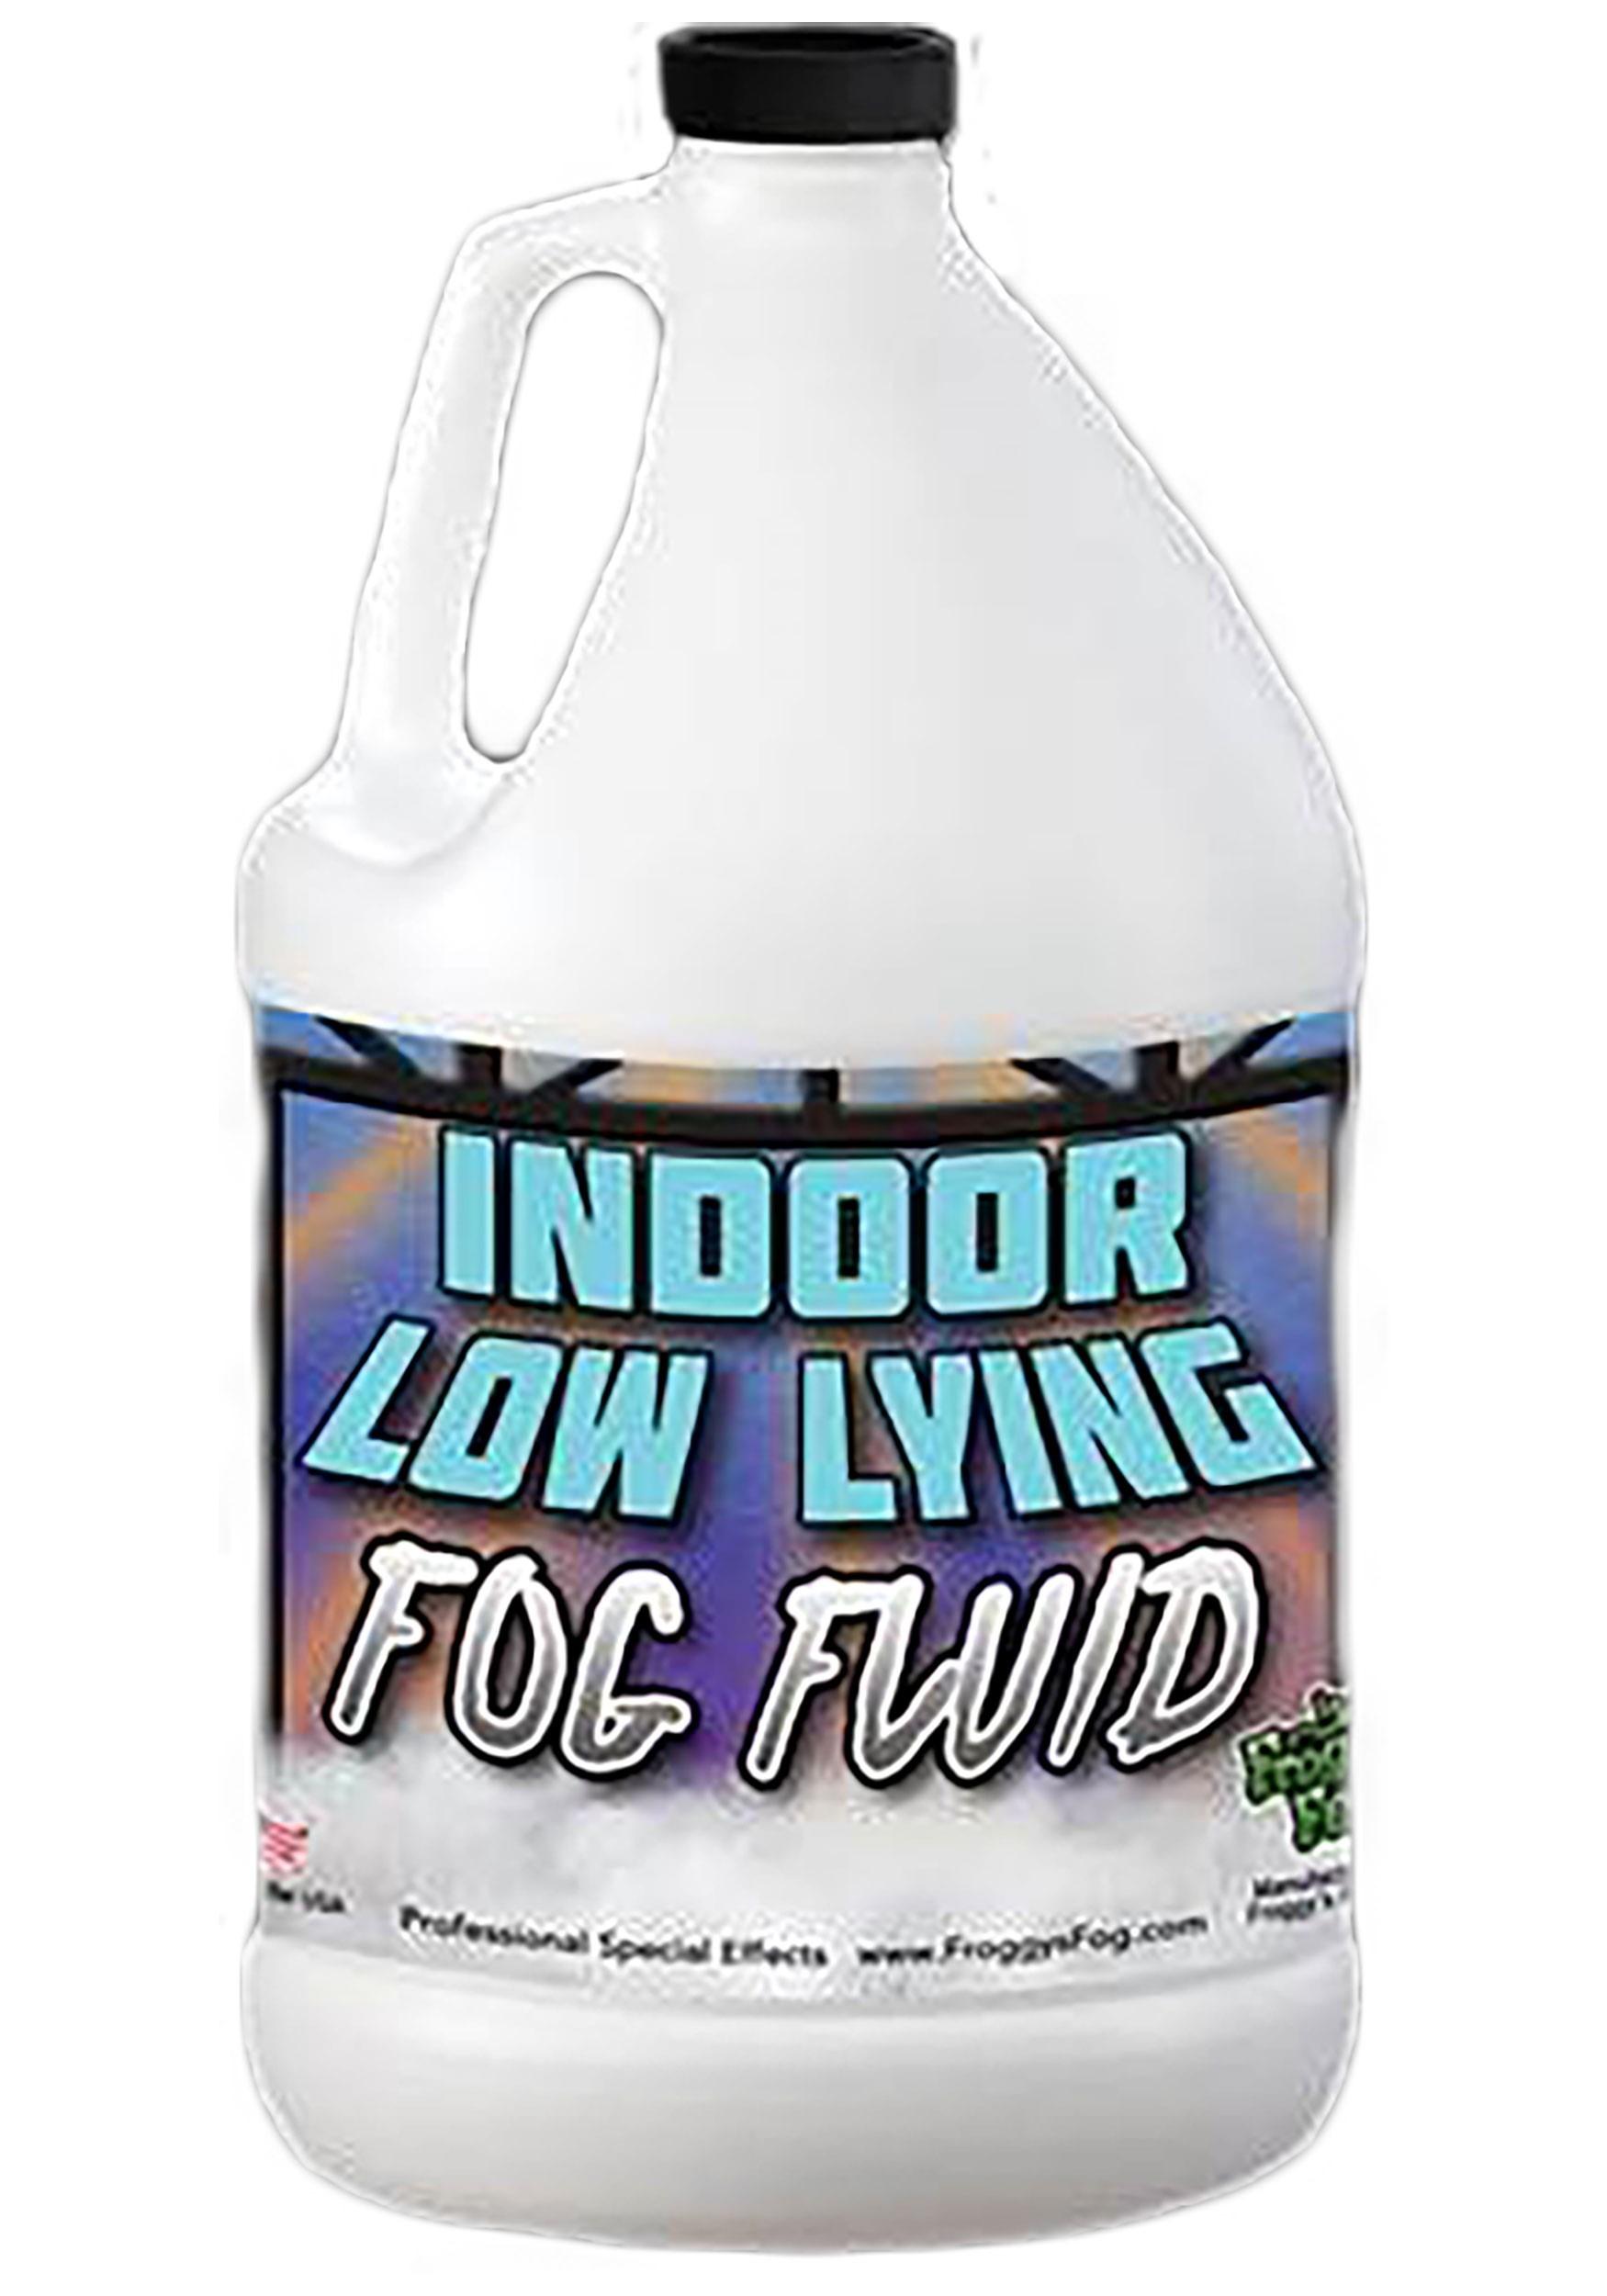 Indoor Low Lying Froggy's Fog Fluid